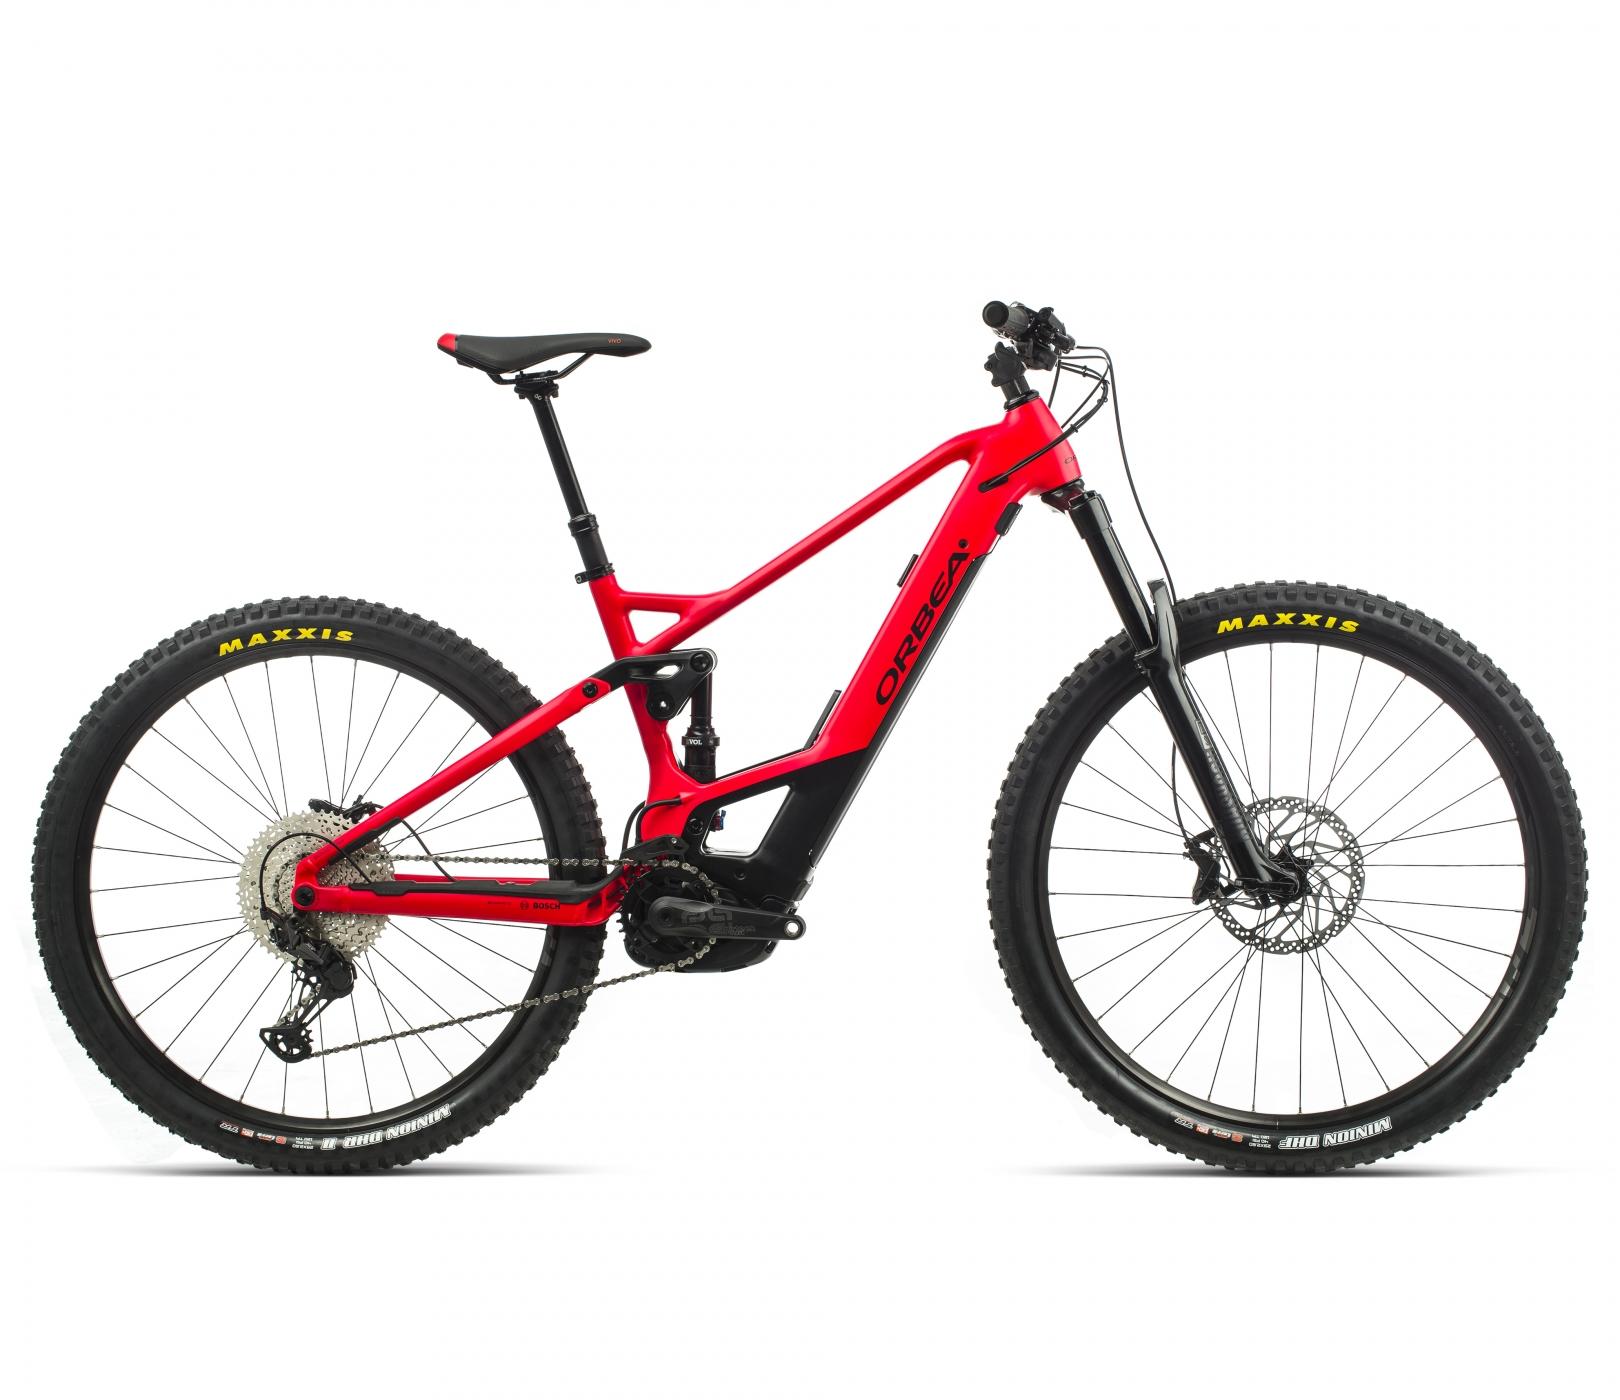 ORBEA WILD FS H20 eBike - BRIGHTRED /ZWART (DOF) @G-Bikes